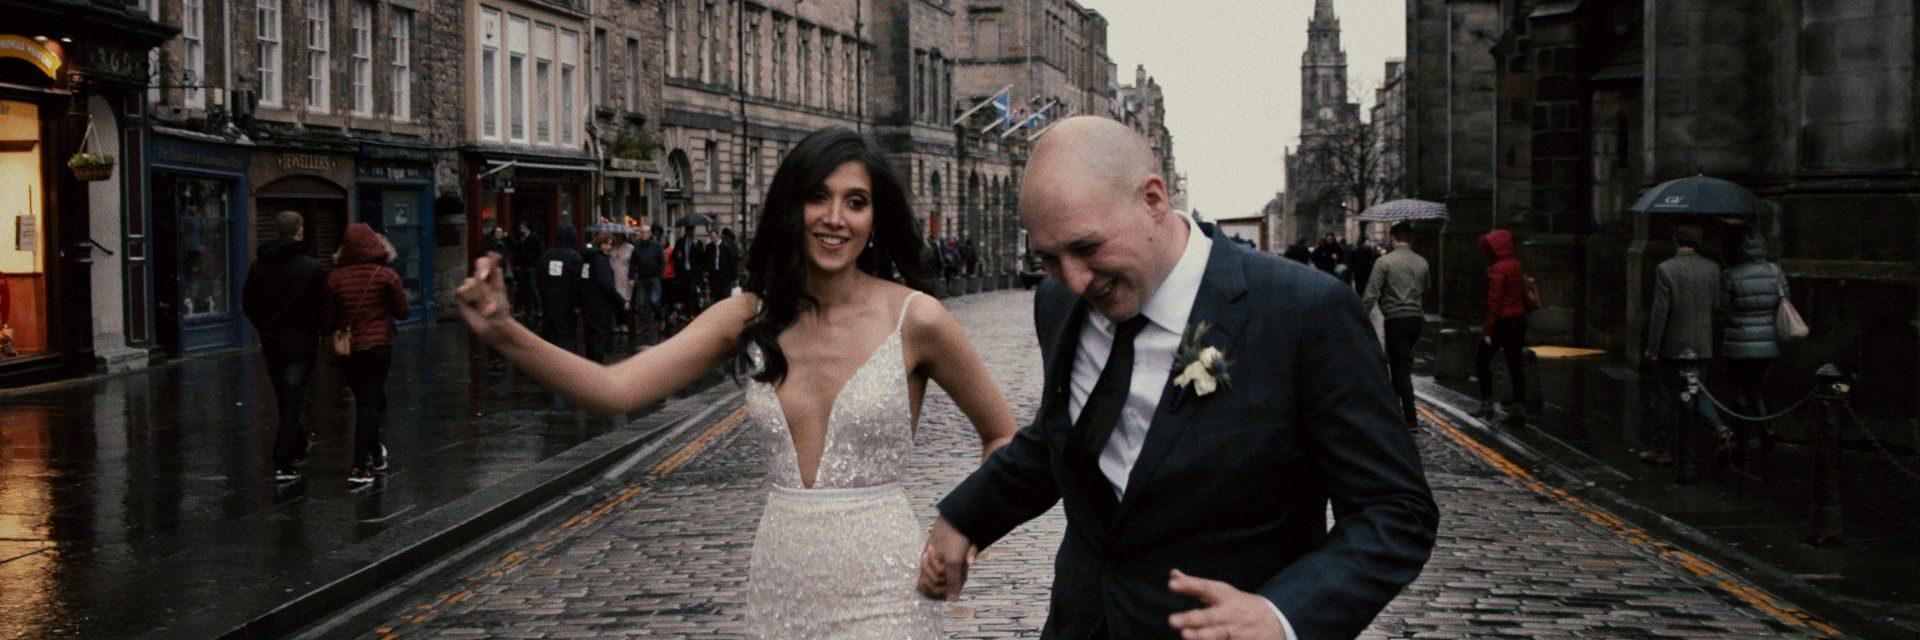 Lucca-wedding-videographer-cinemate-films-04